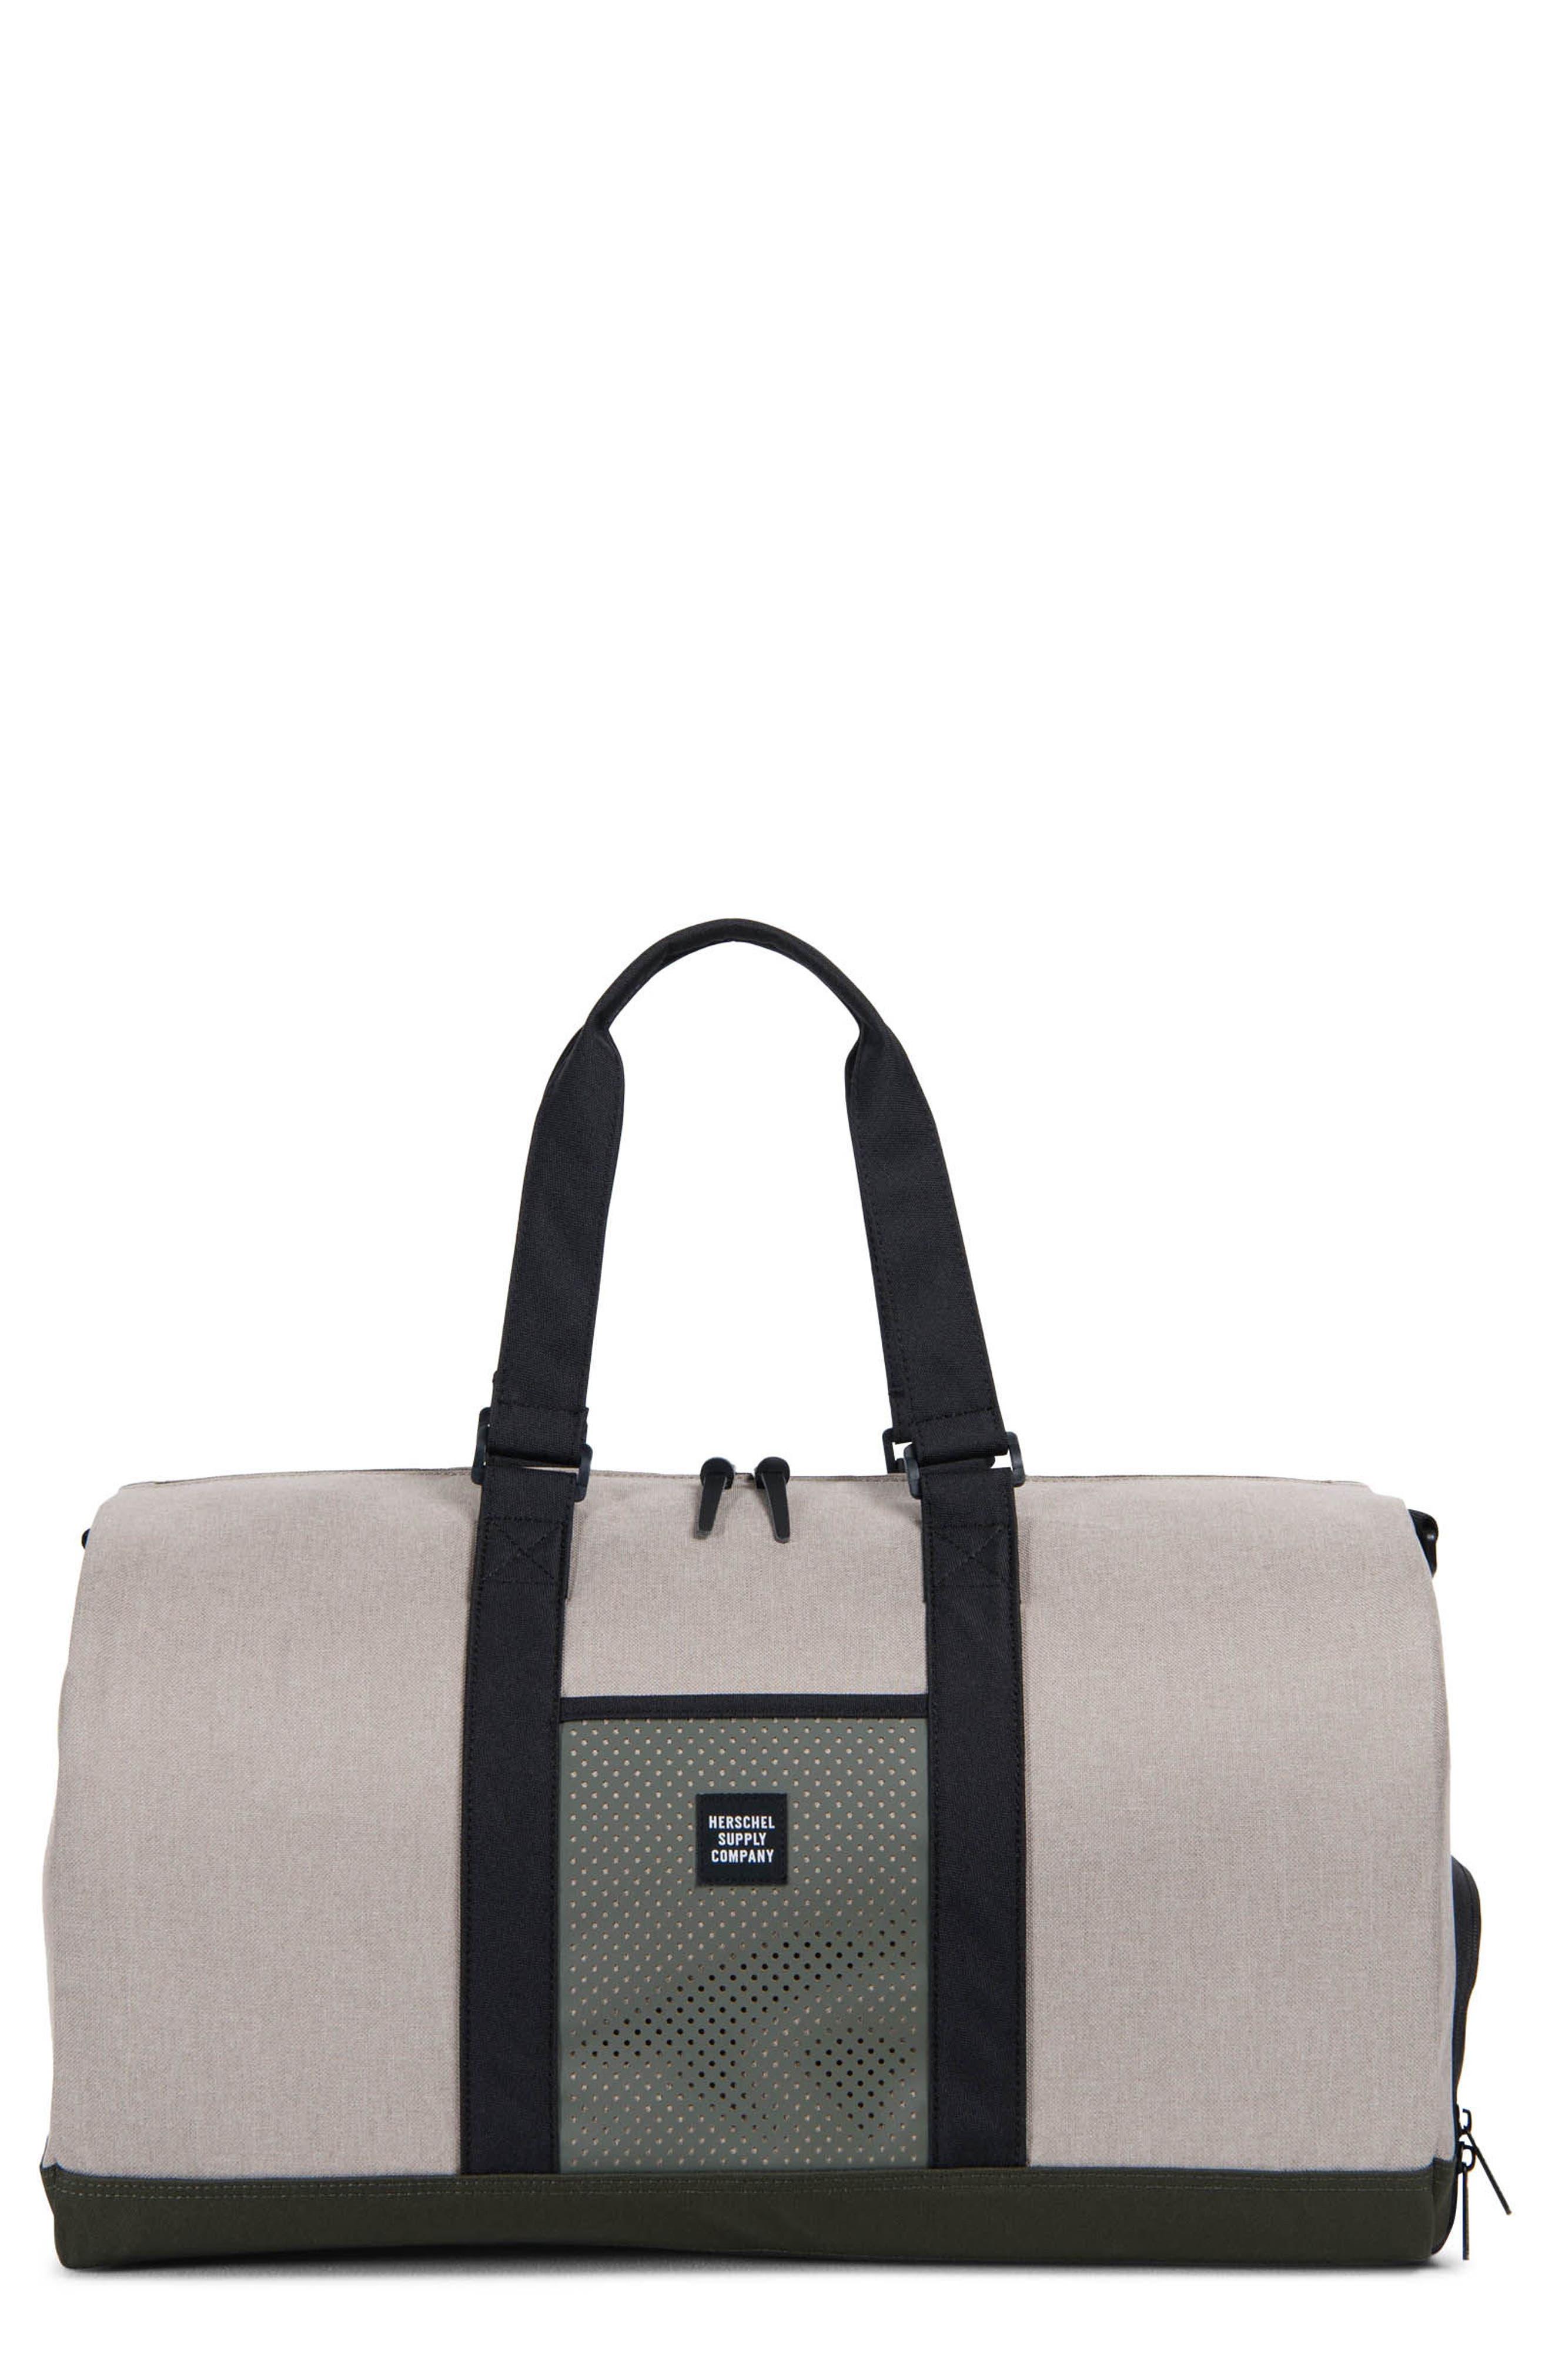 Alternate Image 1 Selected - Herschel Supply Co. 'Novel - Aspect' Duffel Bag